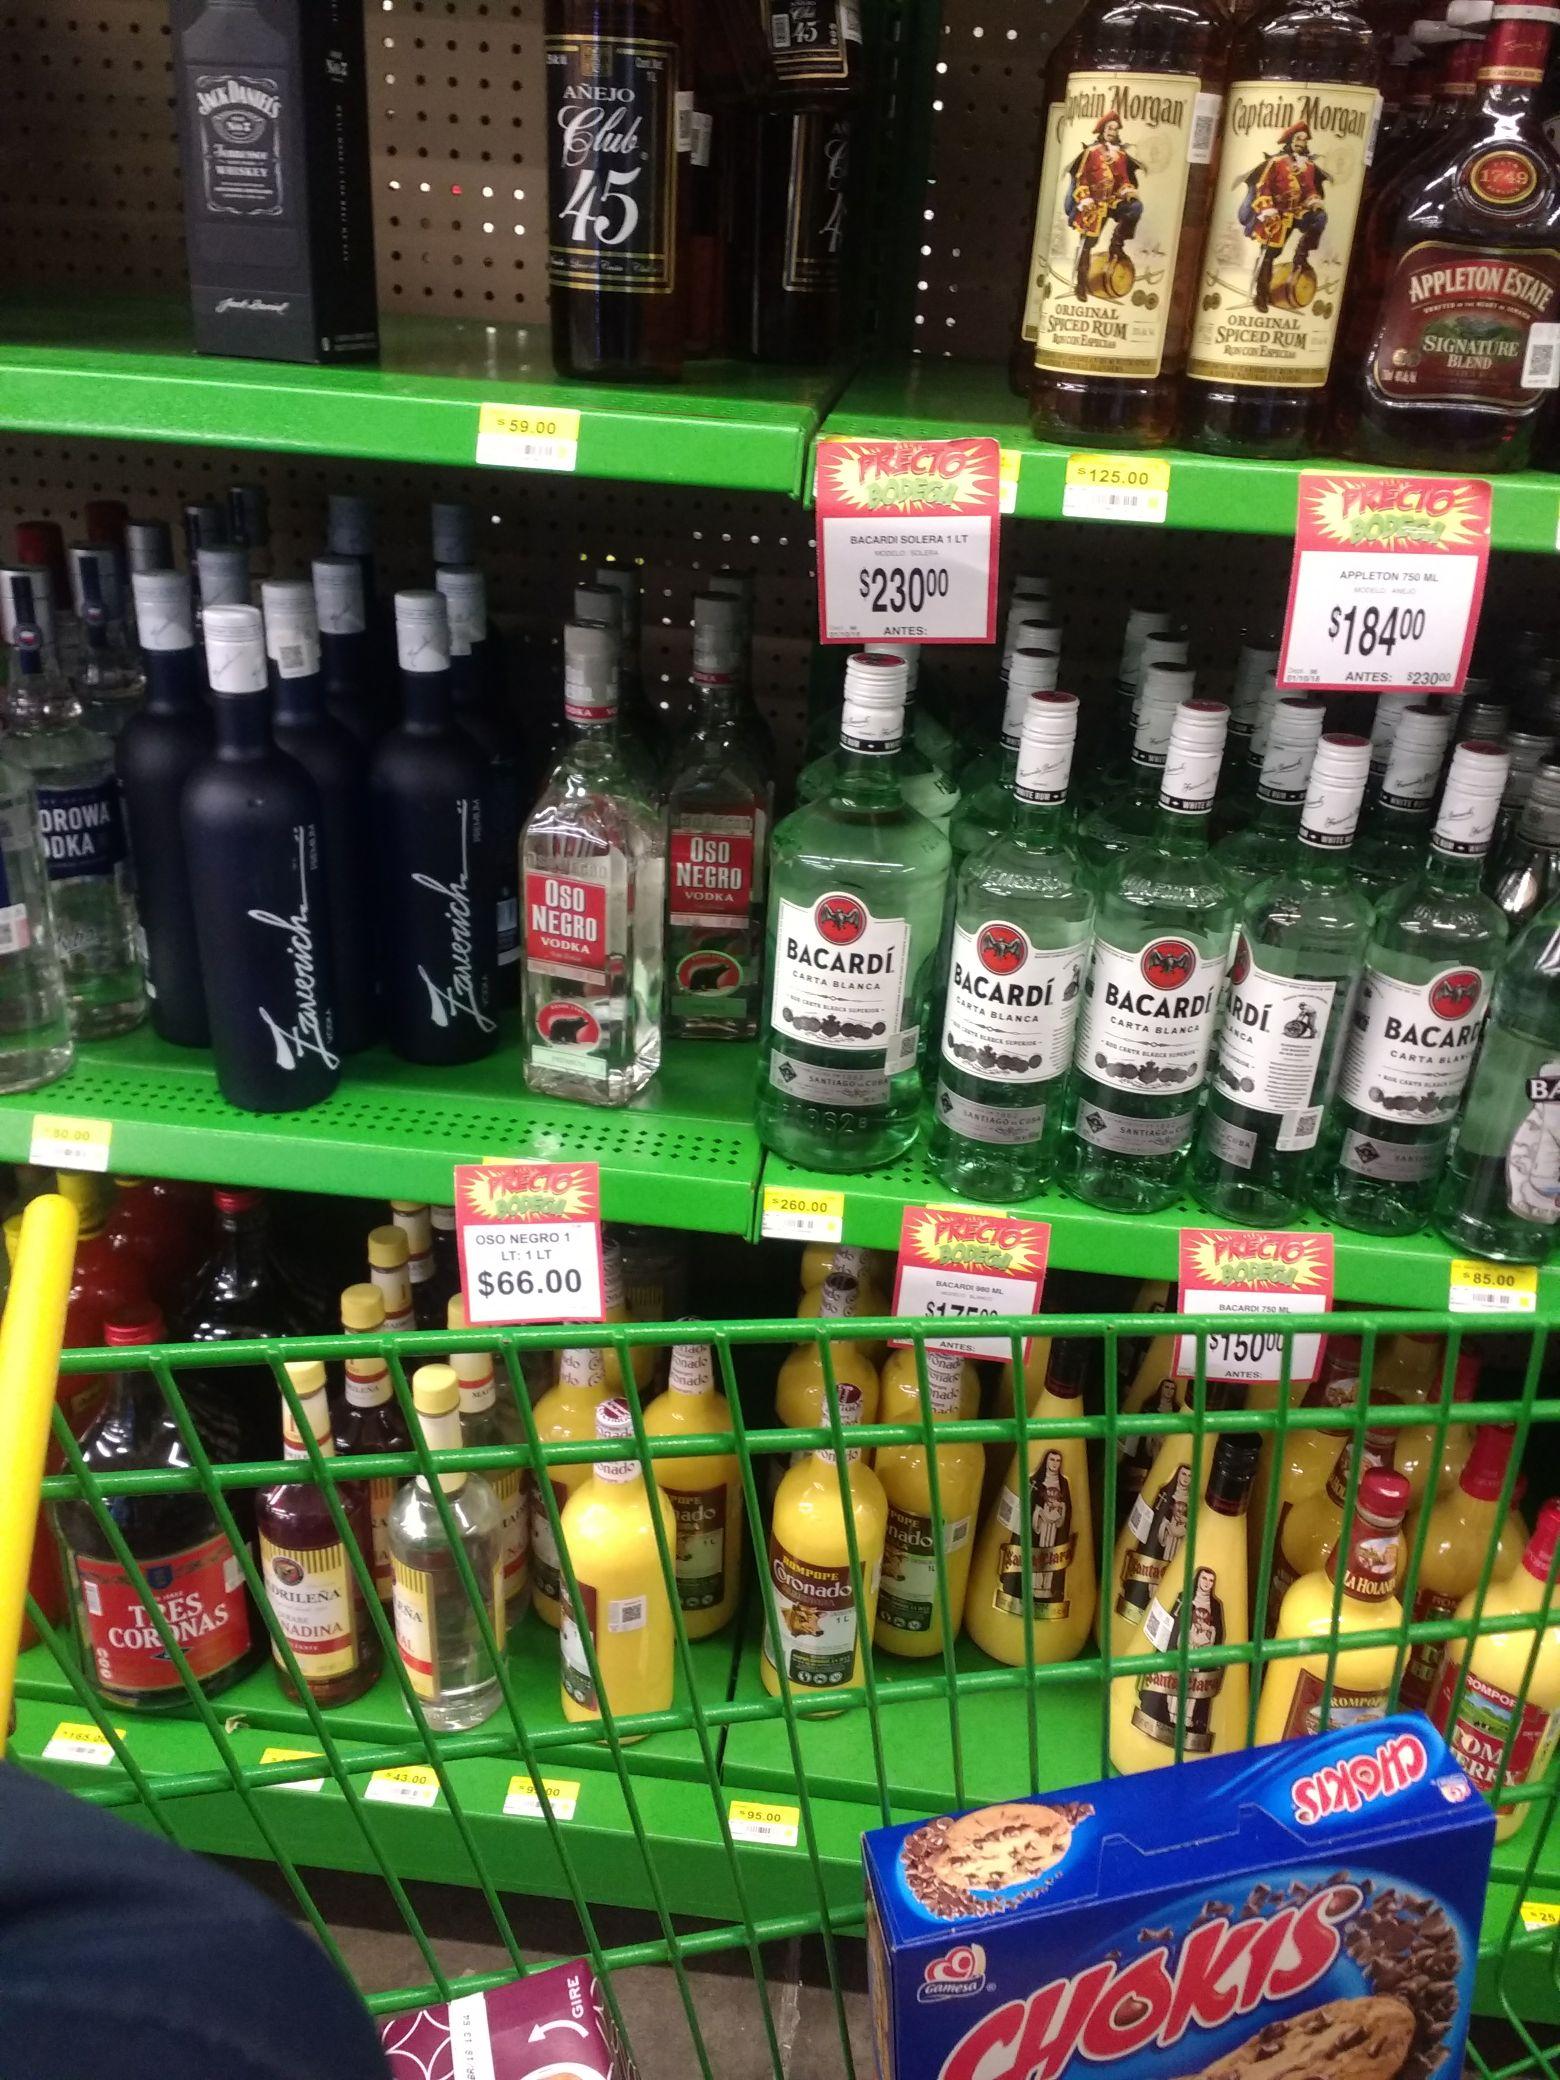 Bodega Aurrerá: Botella de vodka oso negro 1 litro